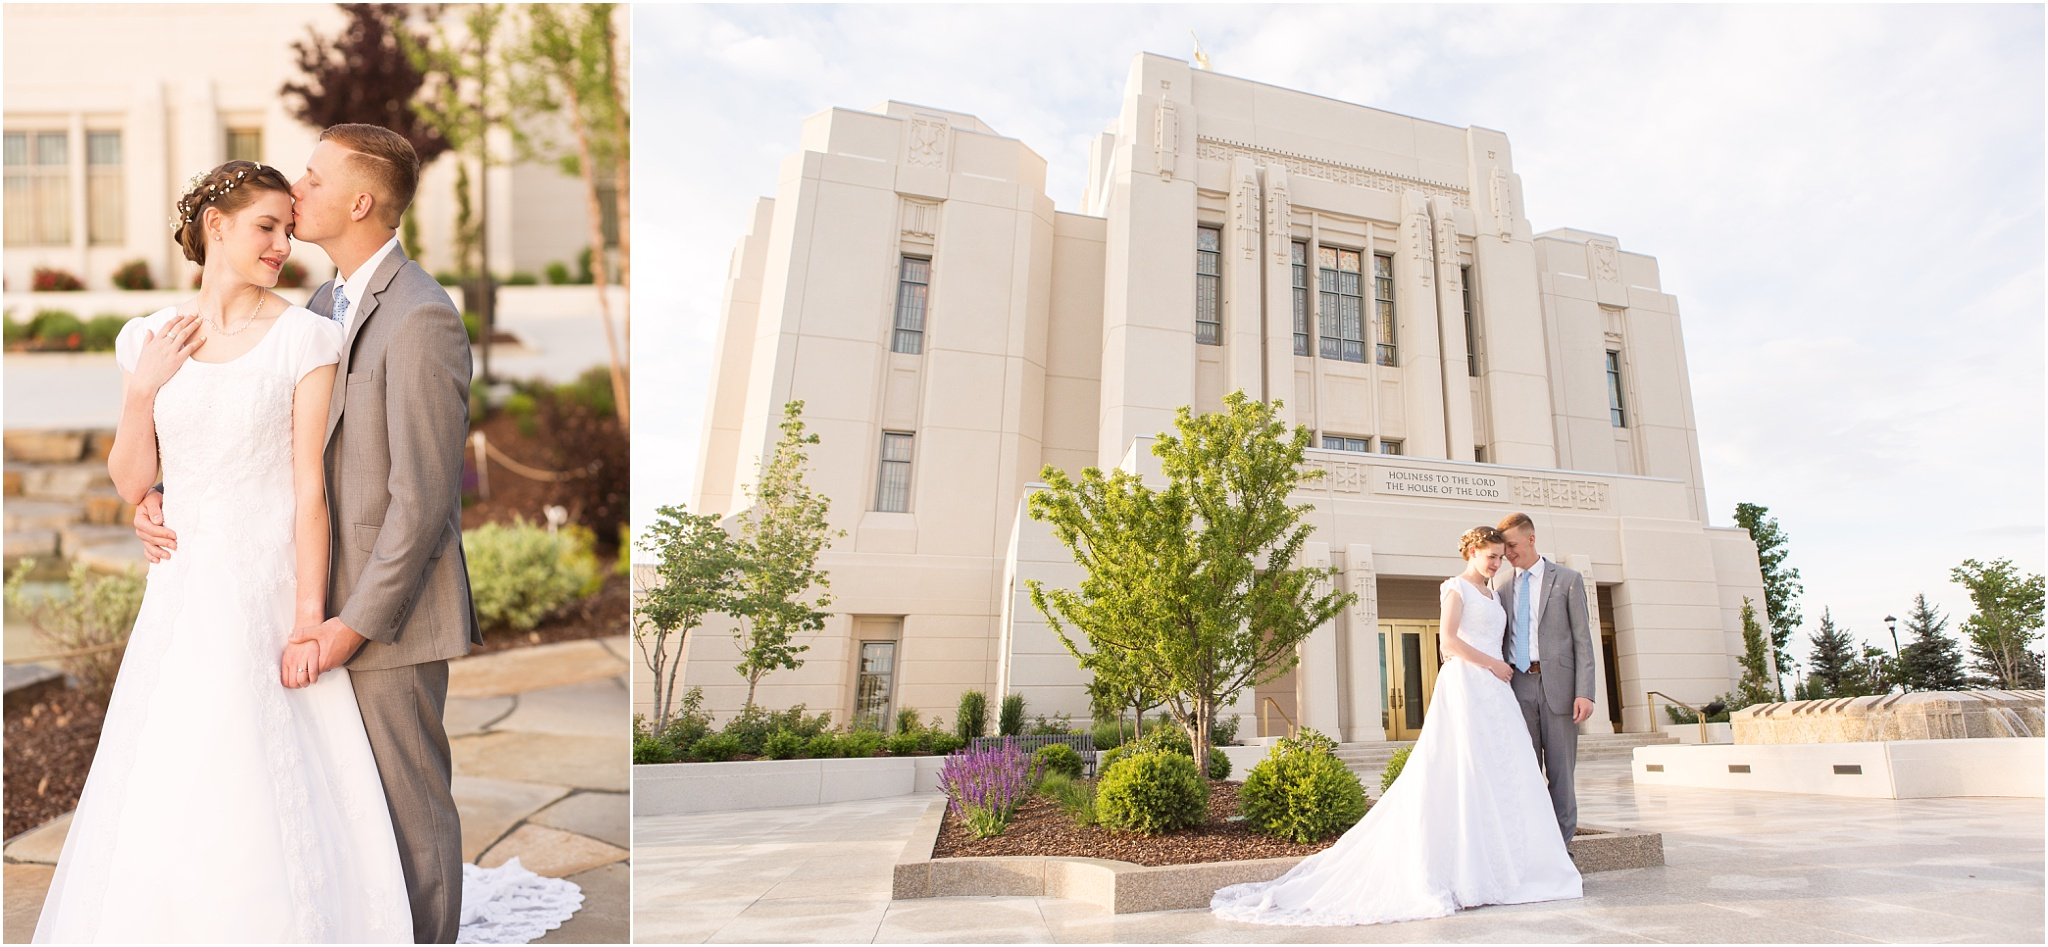 Wedding Photography_Meridian Idaho Temple_Boise Idaho_Leah Southwick Photography_0031.jpg